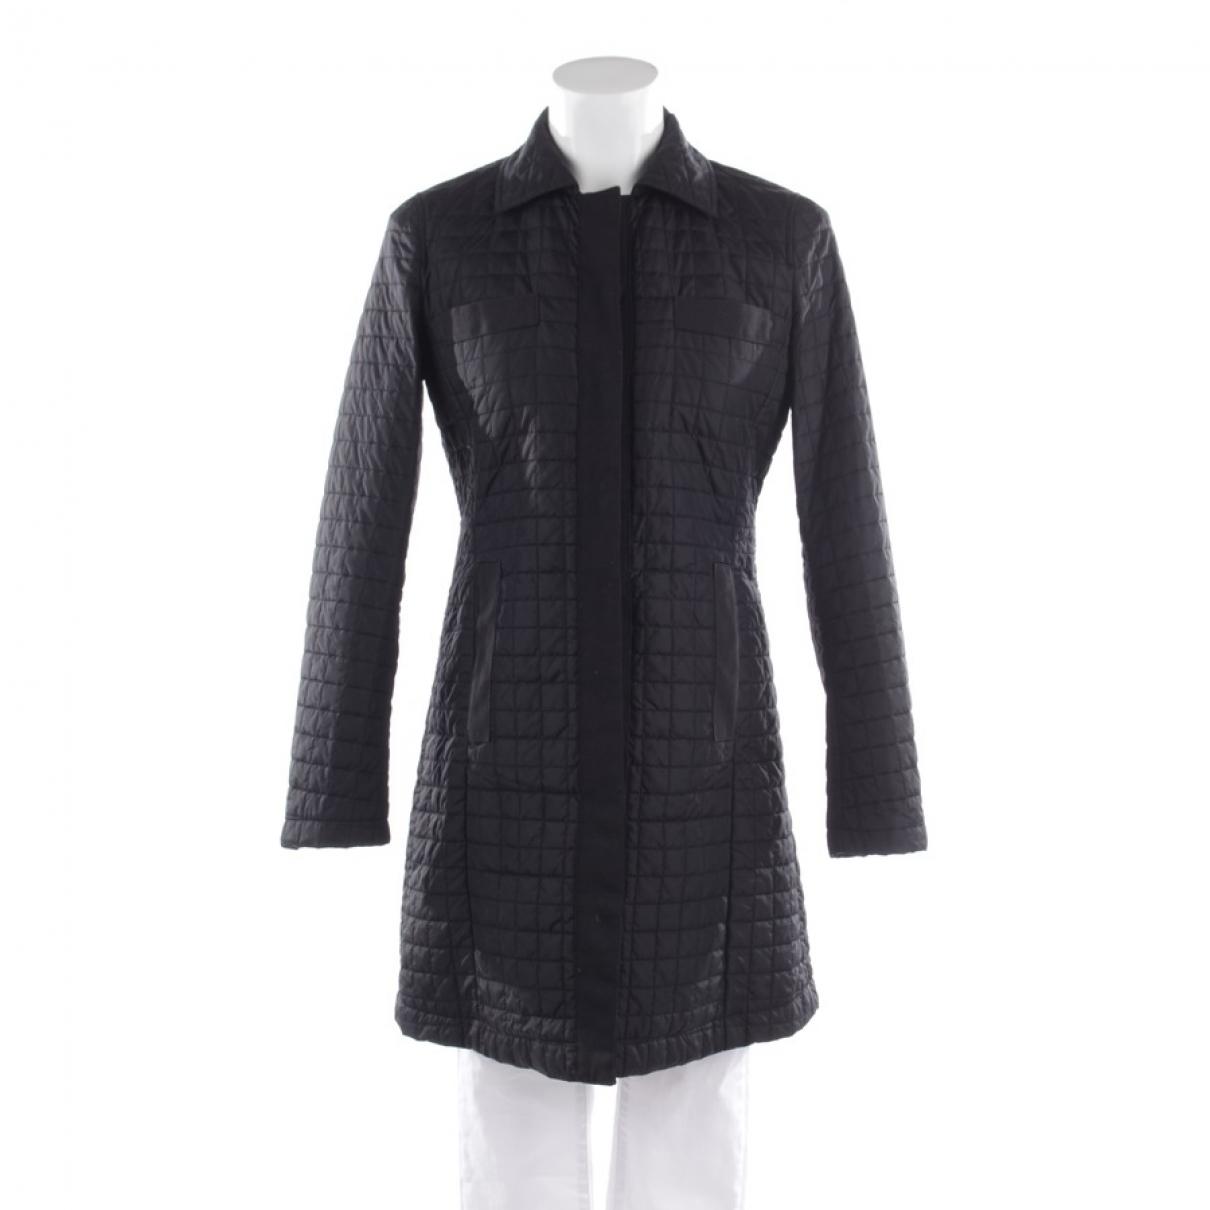 Max Mara \N Black jacket for Women 36 FR